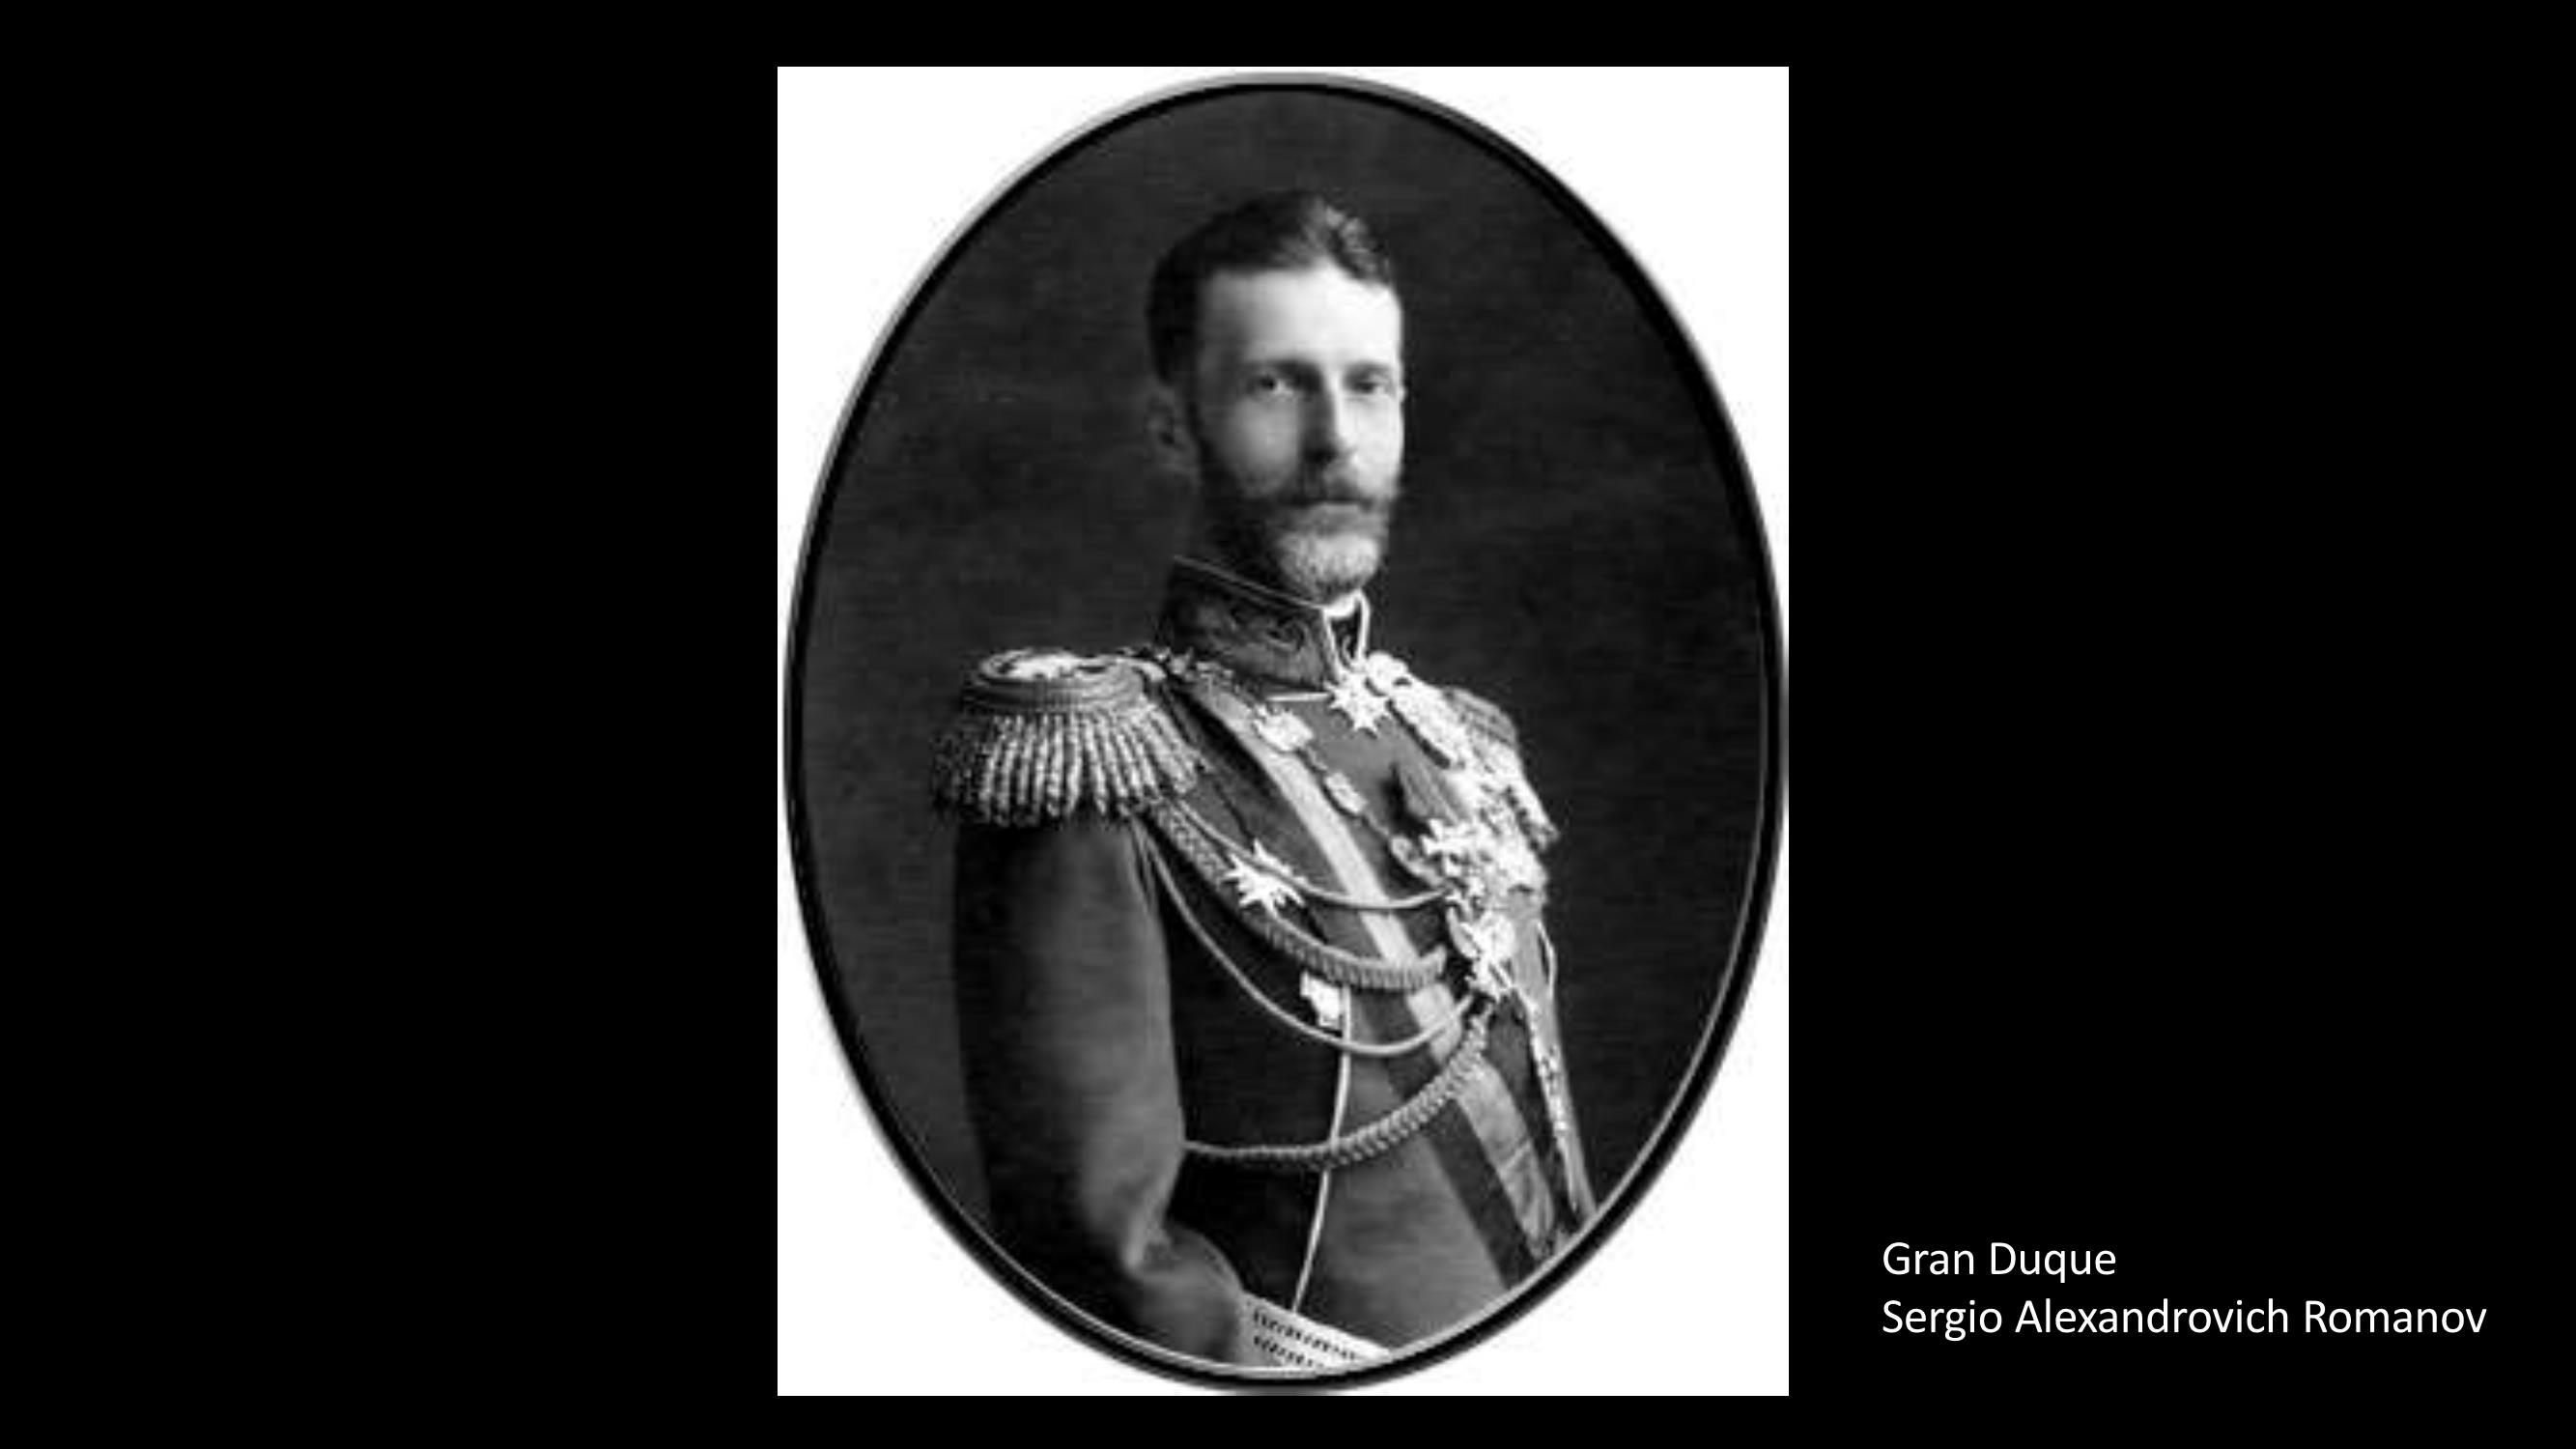 [6] Gran Duque Sergio Alexandrovich Romanov